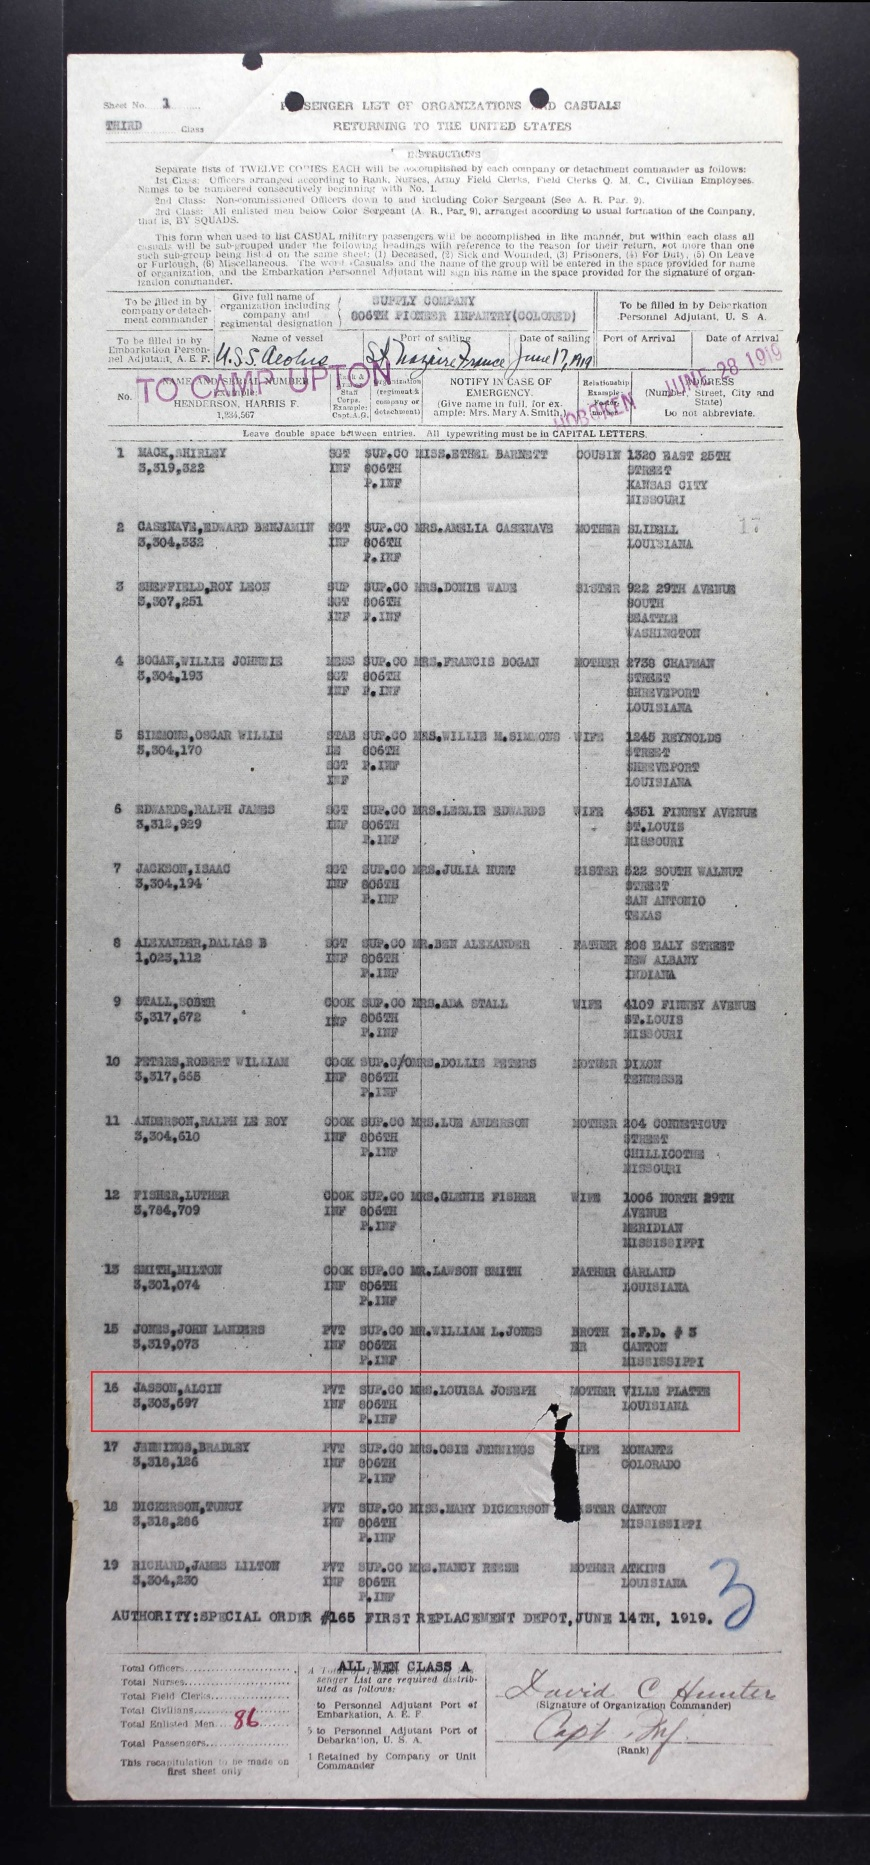 US Army Transport Service Passenger Lists, 1910-1939 for Alcin Jasson _June 1919 return